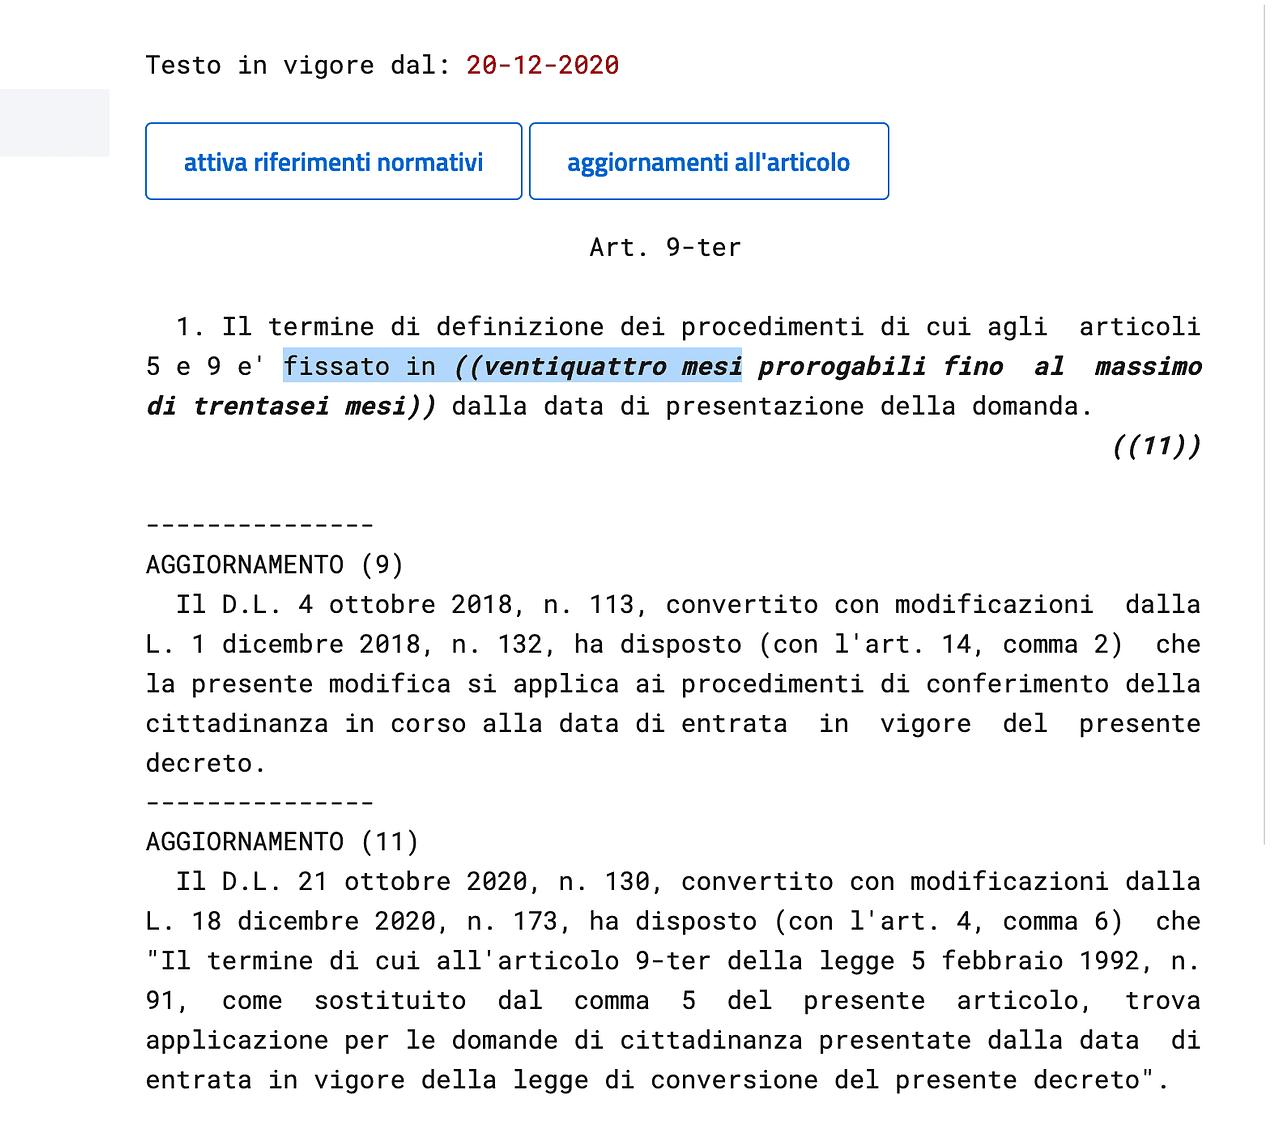 CITTADINANZA-ITALIANA-2-ANNI-TEMPI-ATTESA-CITTADINANZA-2-ANNI-BERSANI-AVVOCATO-CITTADINANZA-2-anni-legge